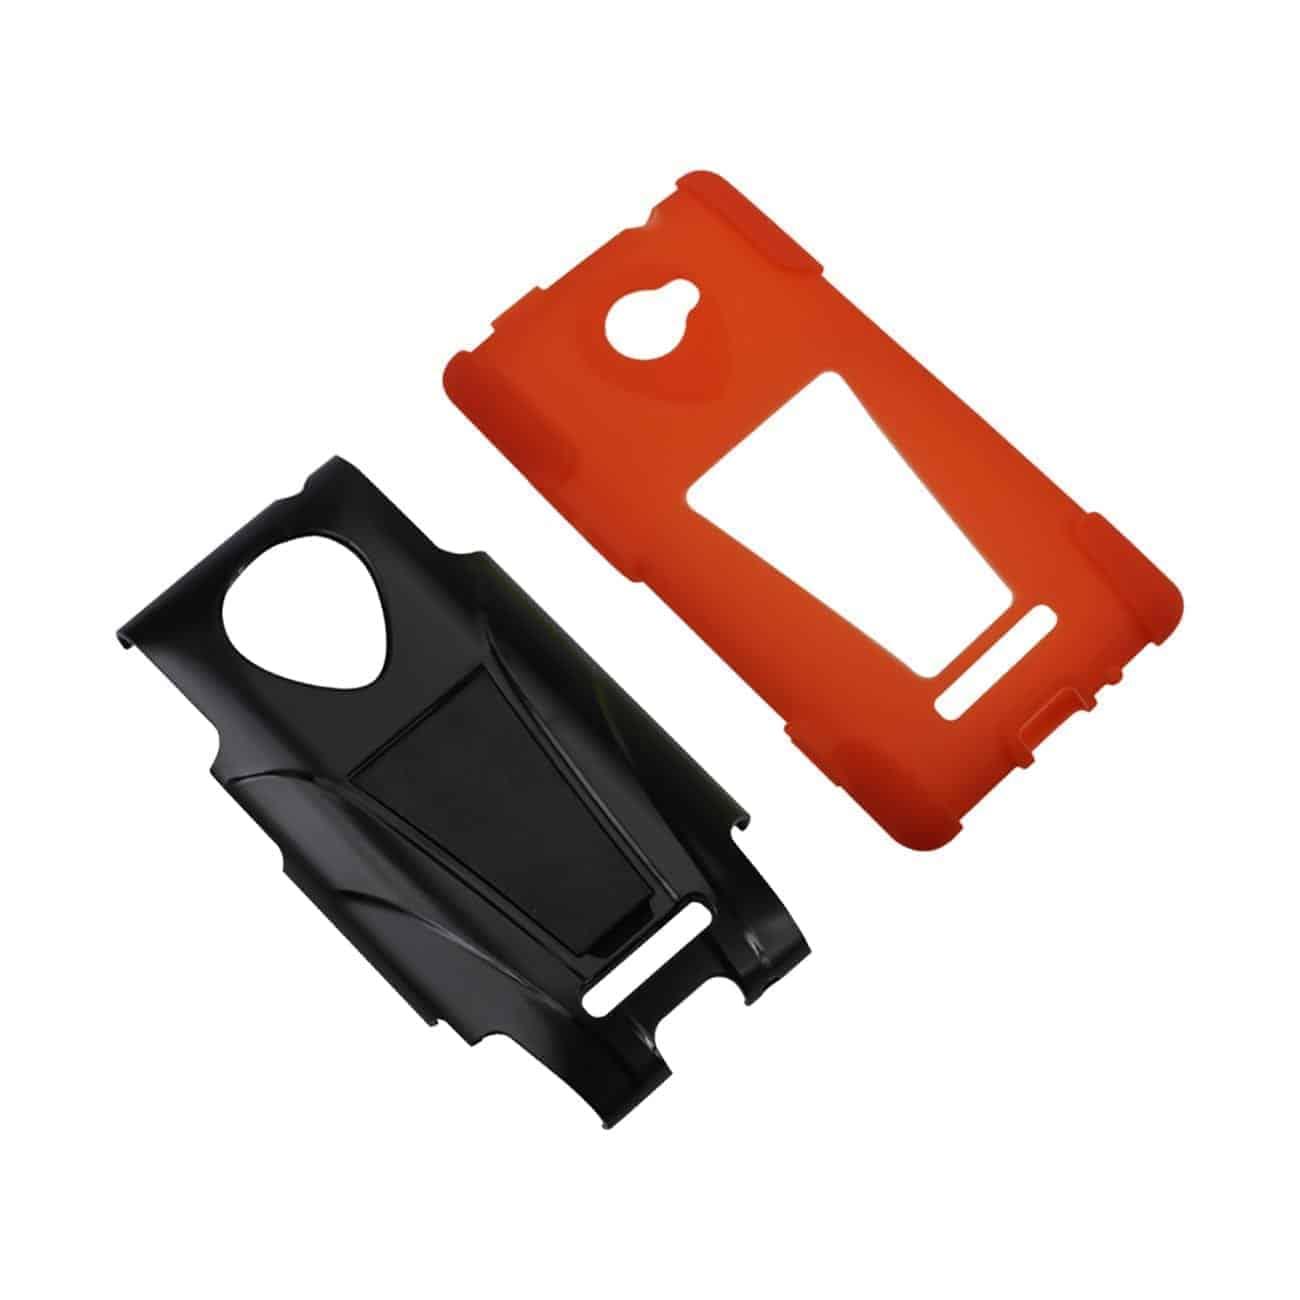 HTC WINDOWS PHONE 8X HYBRID HEAVY DUTY CASE WITH KICKSTAND IN BLACK ORANGE